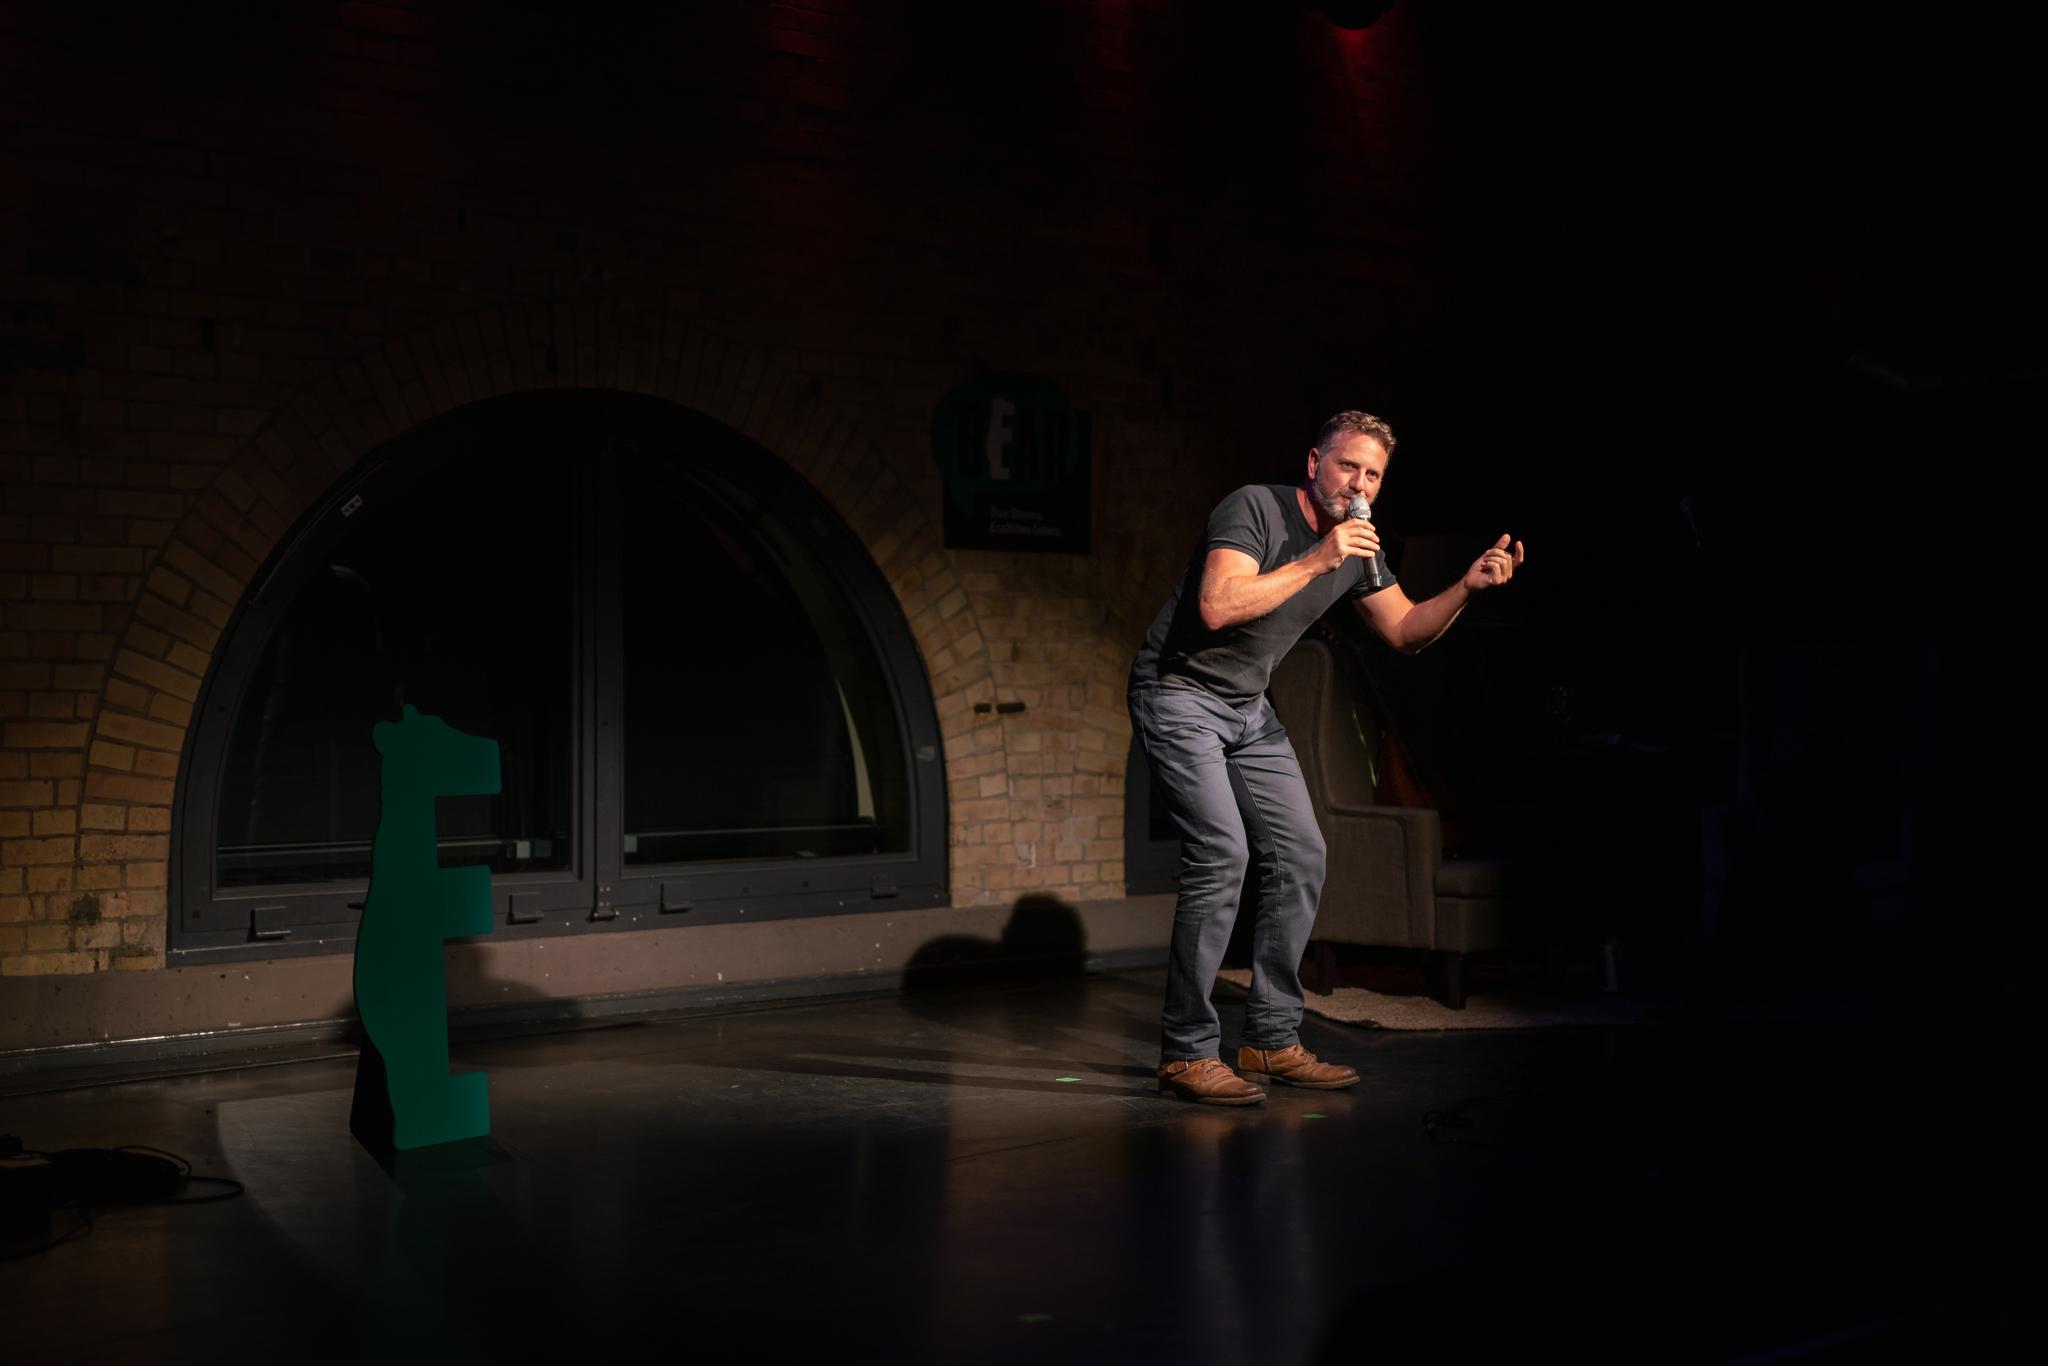 Ben on stage at The Bear, Maschinenhaus im Kulturbrauerei; Photo: Felix Limmer.